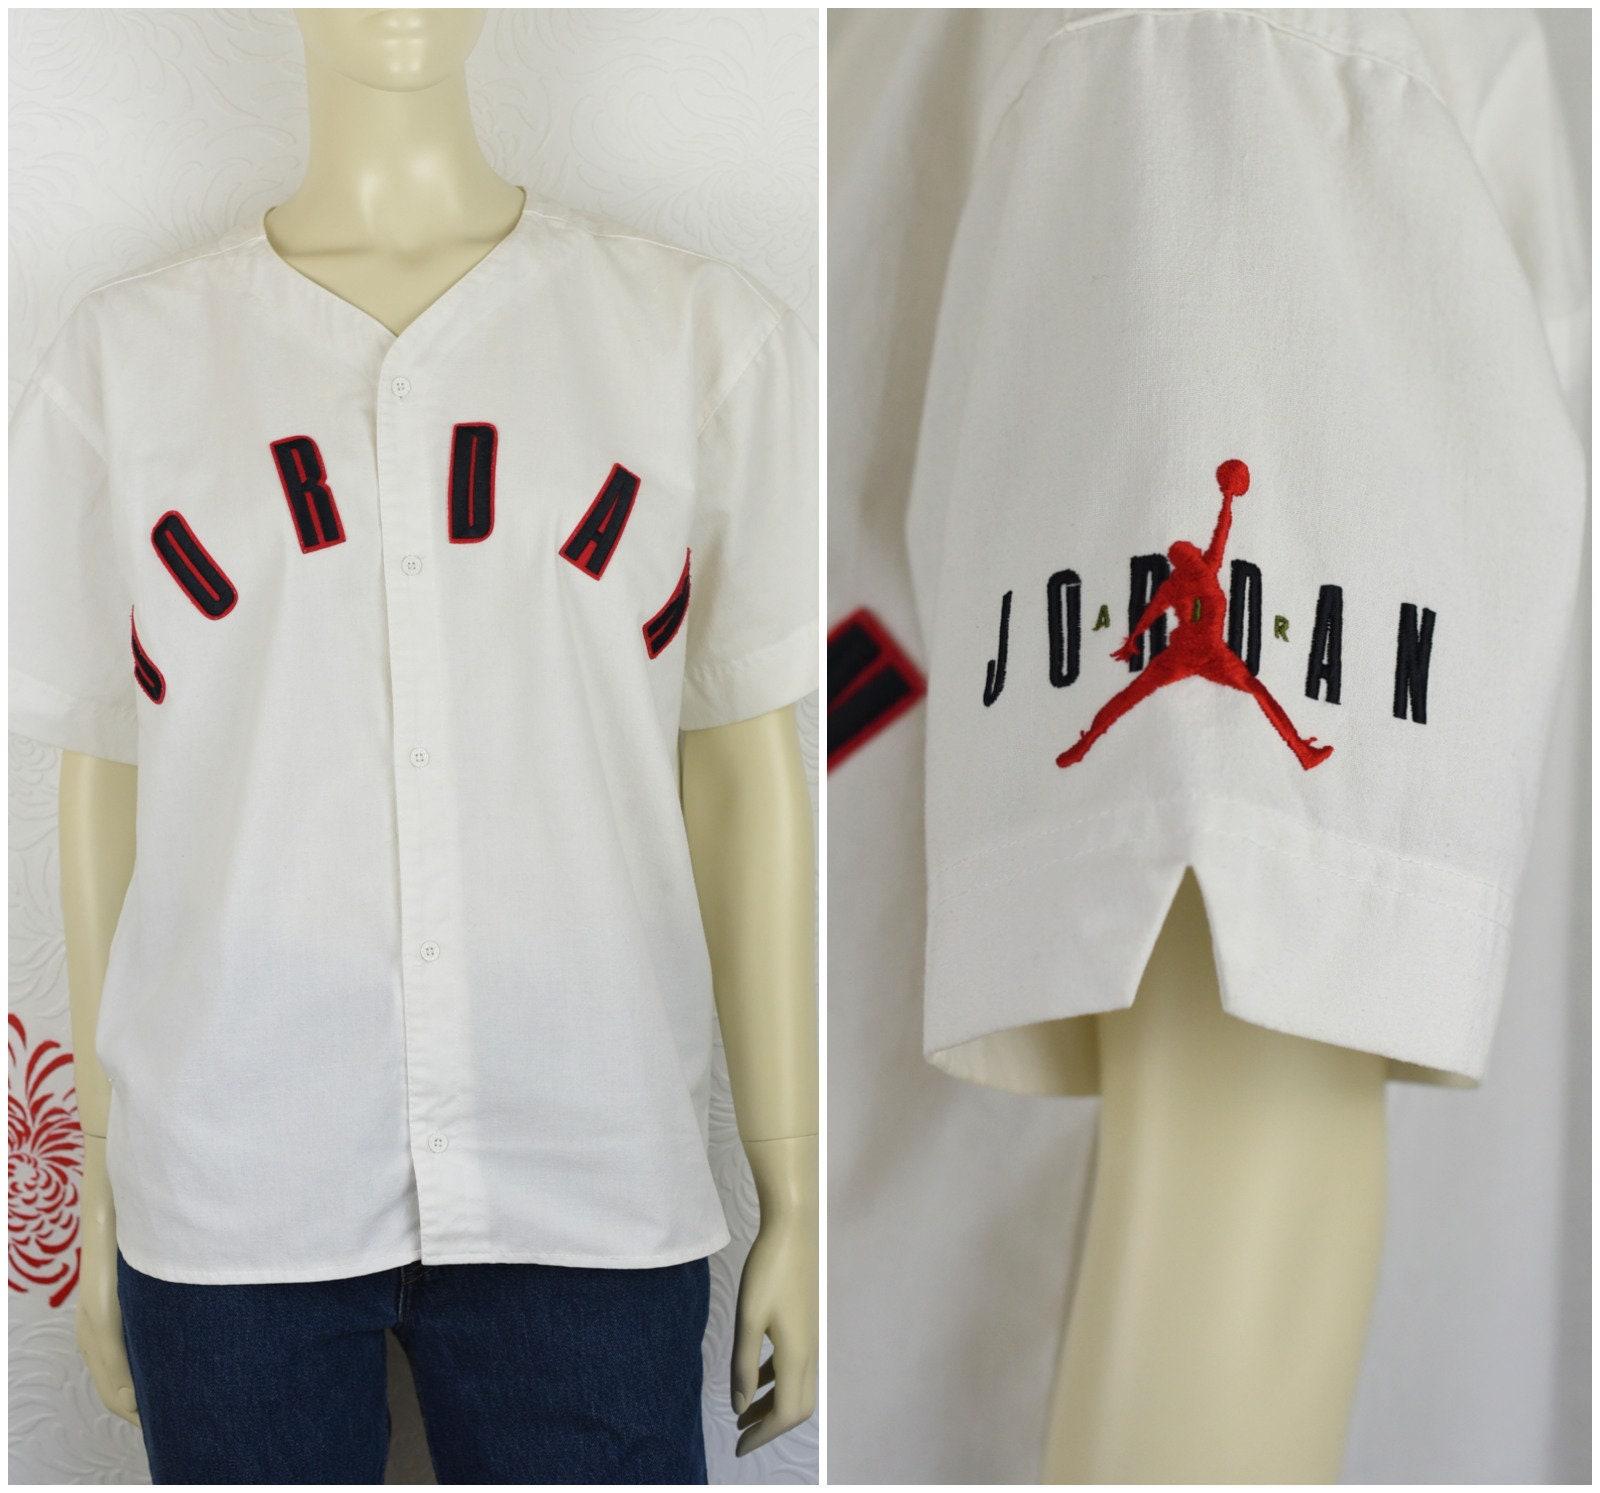 new style 55aa4 d831c Vintage Jordan Baseball Jersey | Nike | Michael Jordan | 23 | Spellout |  Chicago Bulls | Basketball | Air Jordan | 90s Streetwear | Jumpman